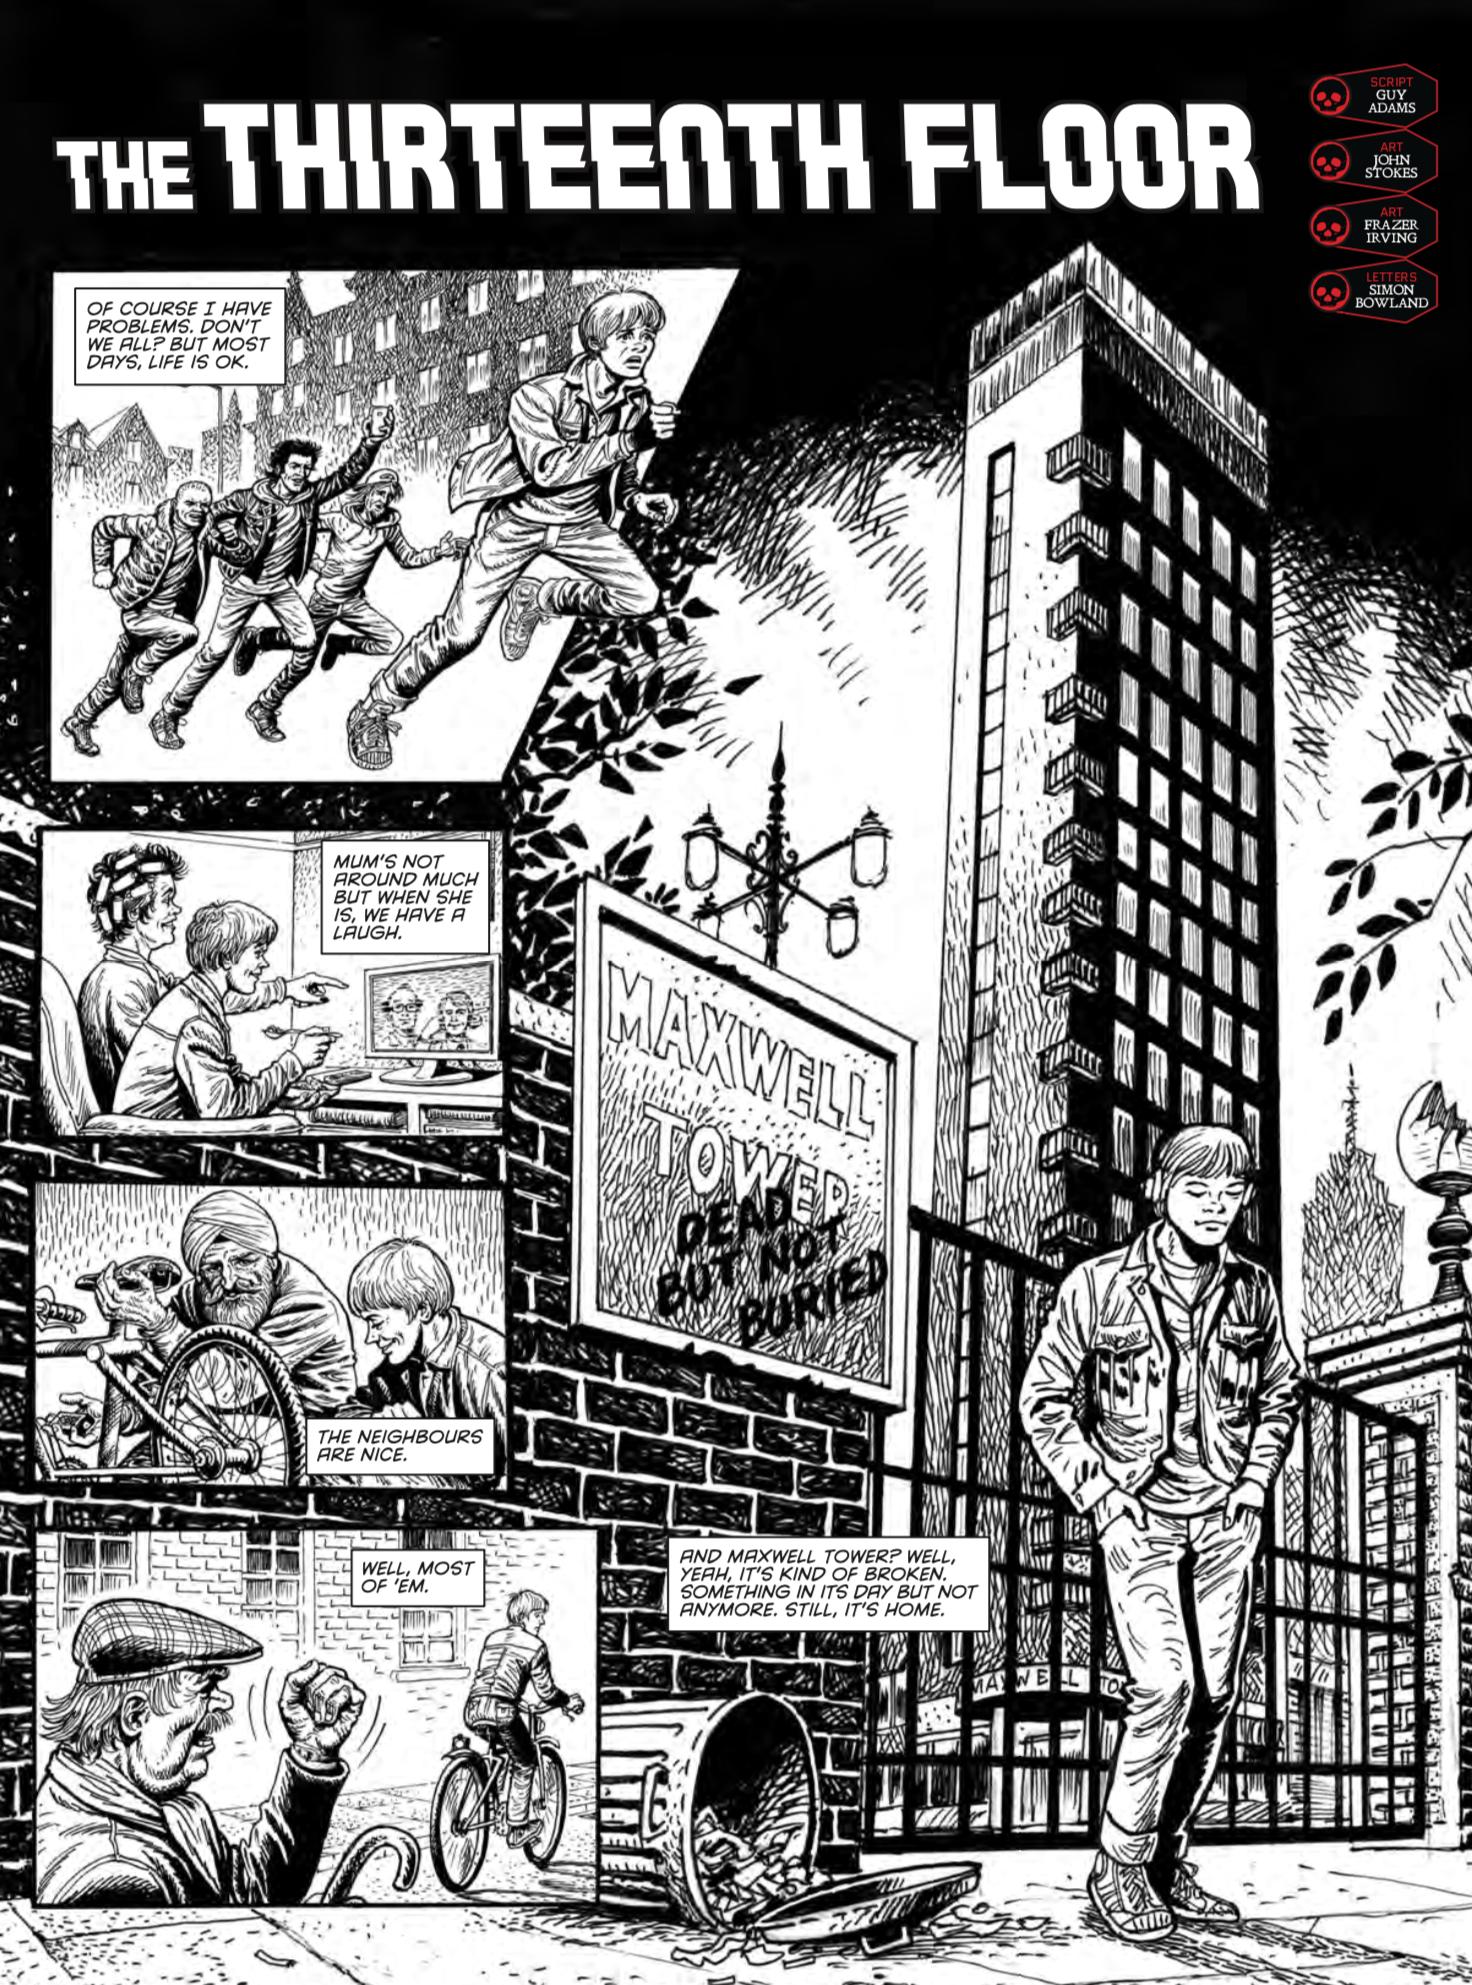 """The Thirteenth Floor"" by Guy Adams, John Stokes and Frazer Irving"